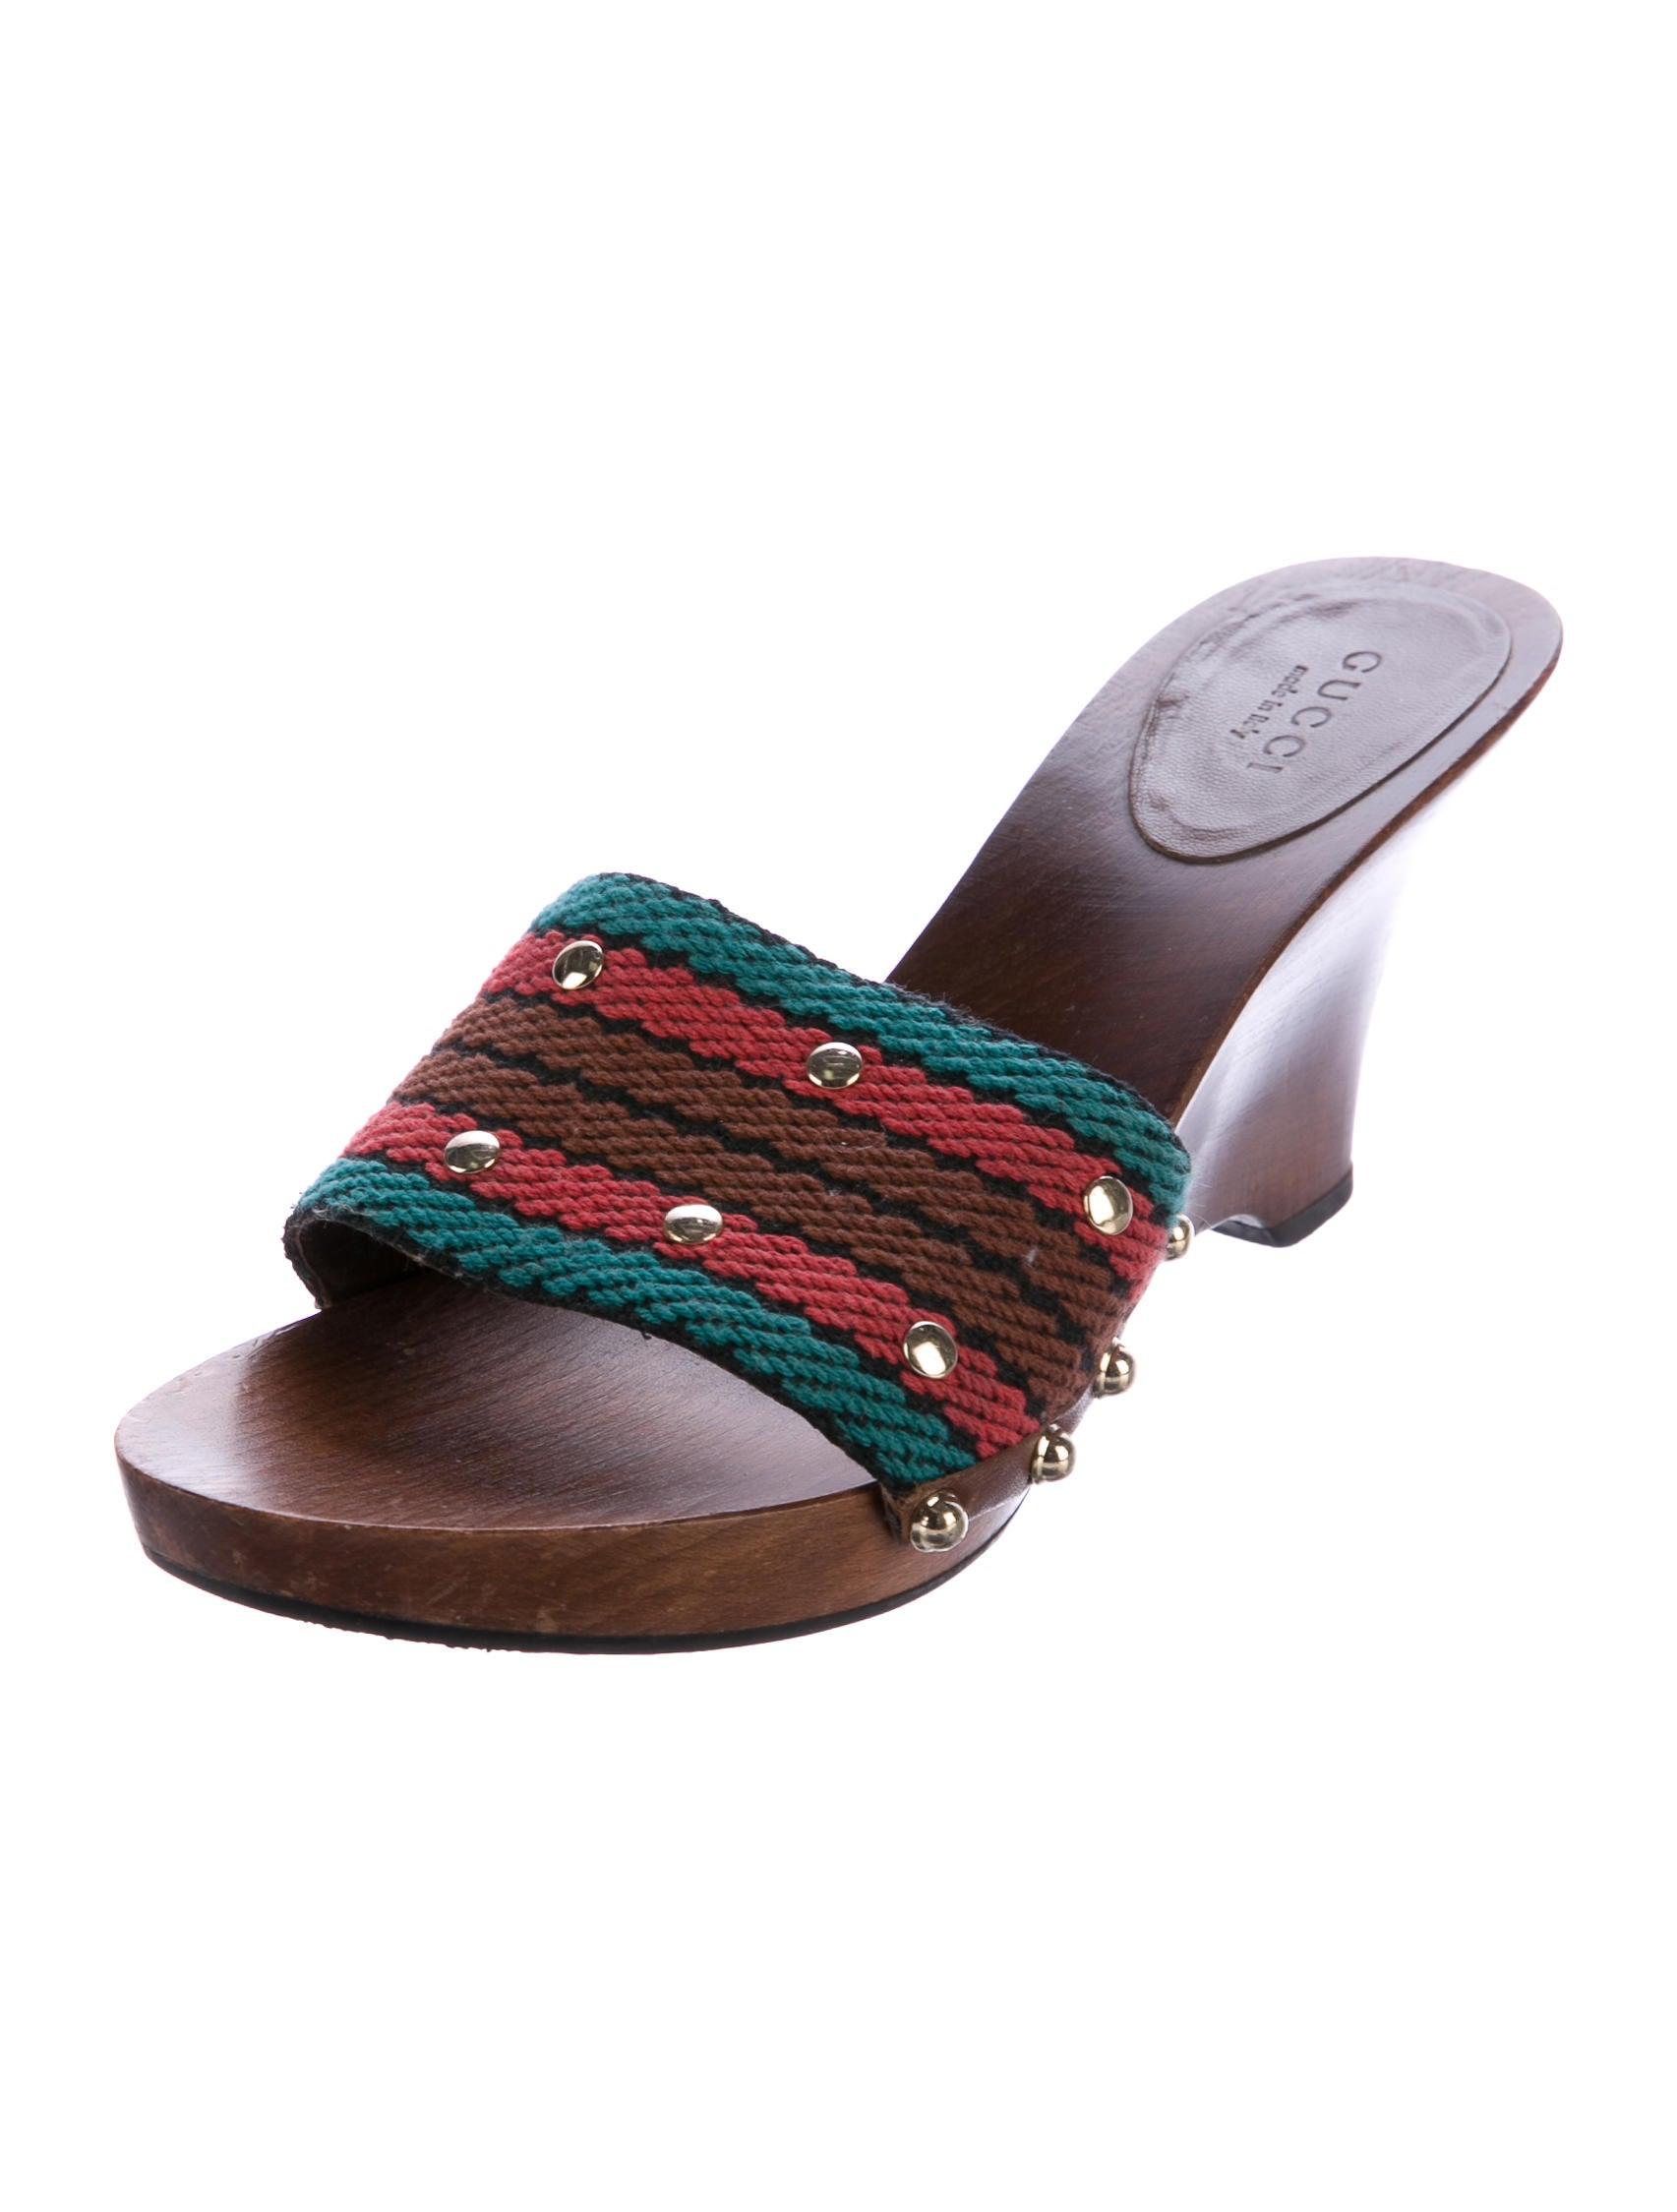 gucci studded canvas slide sandals shoes guc164586